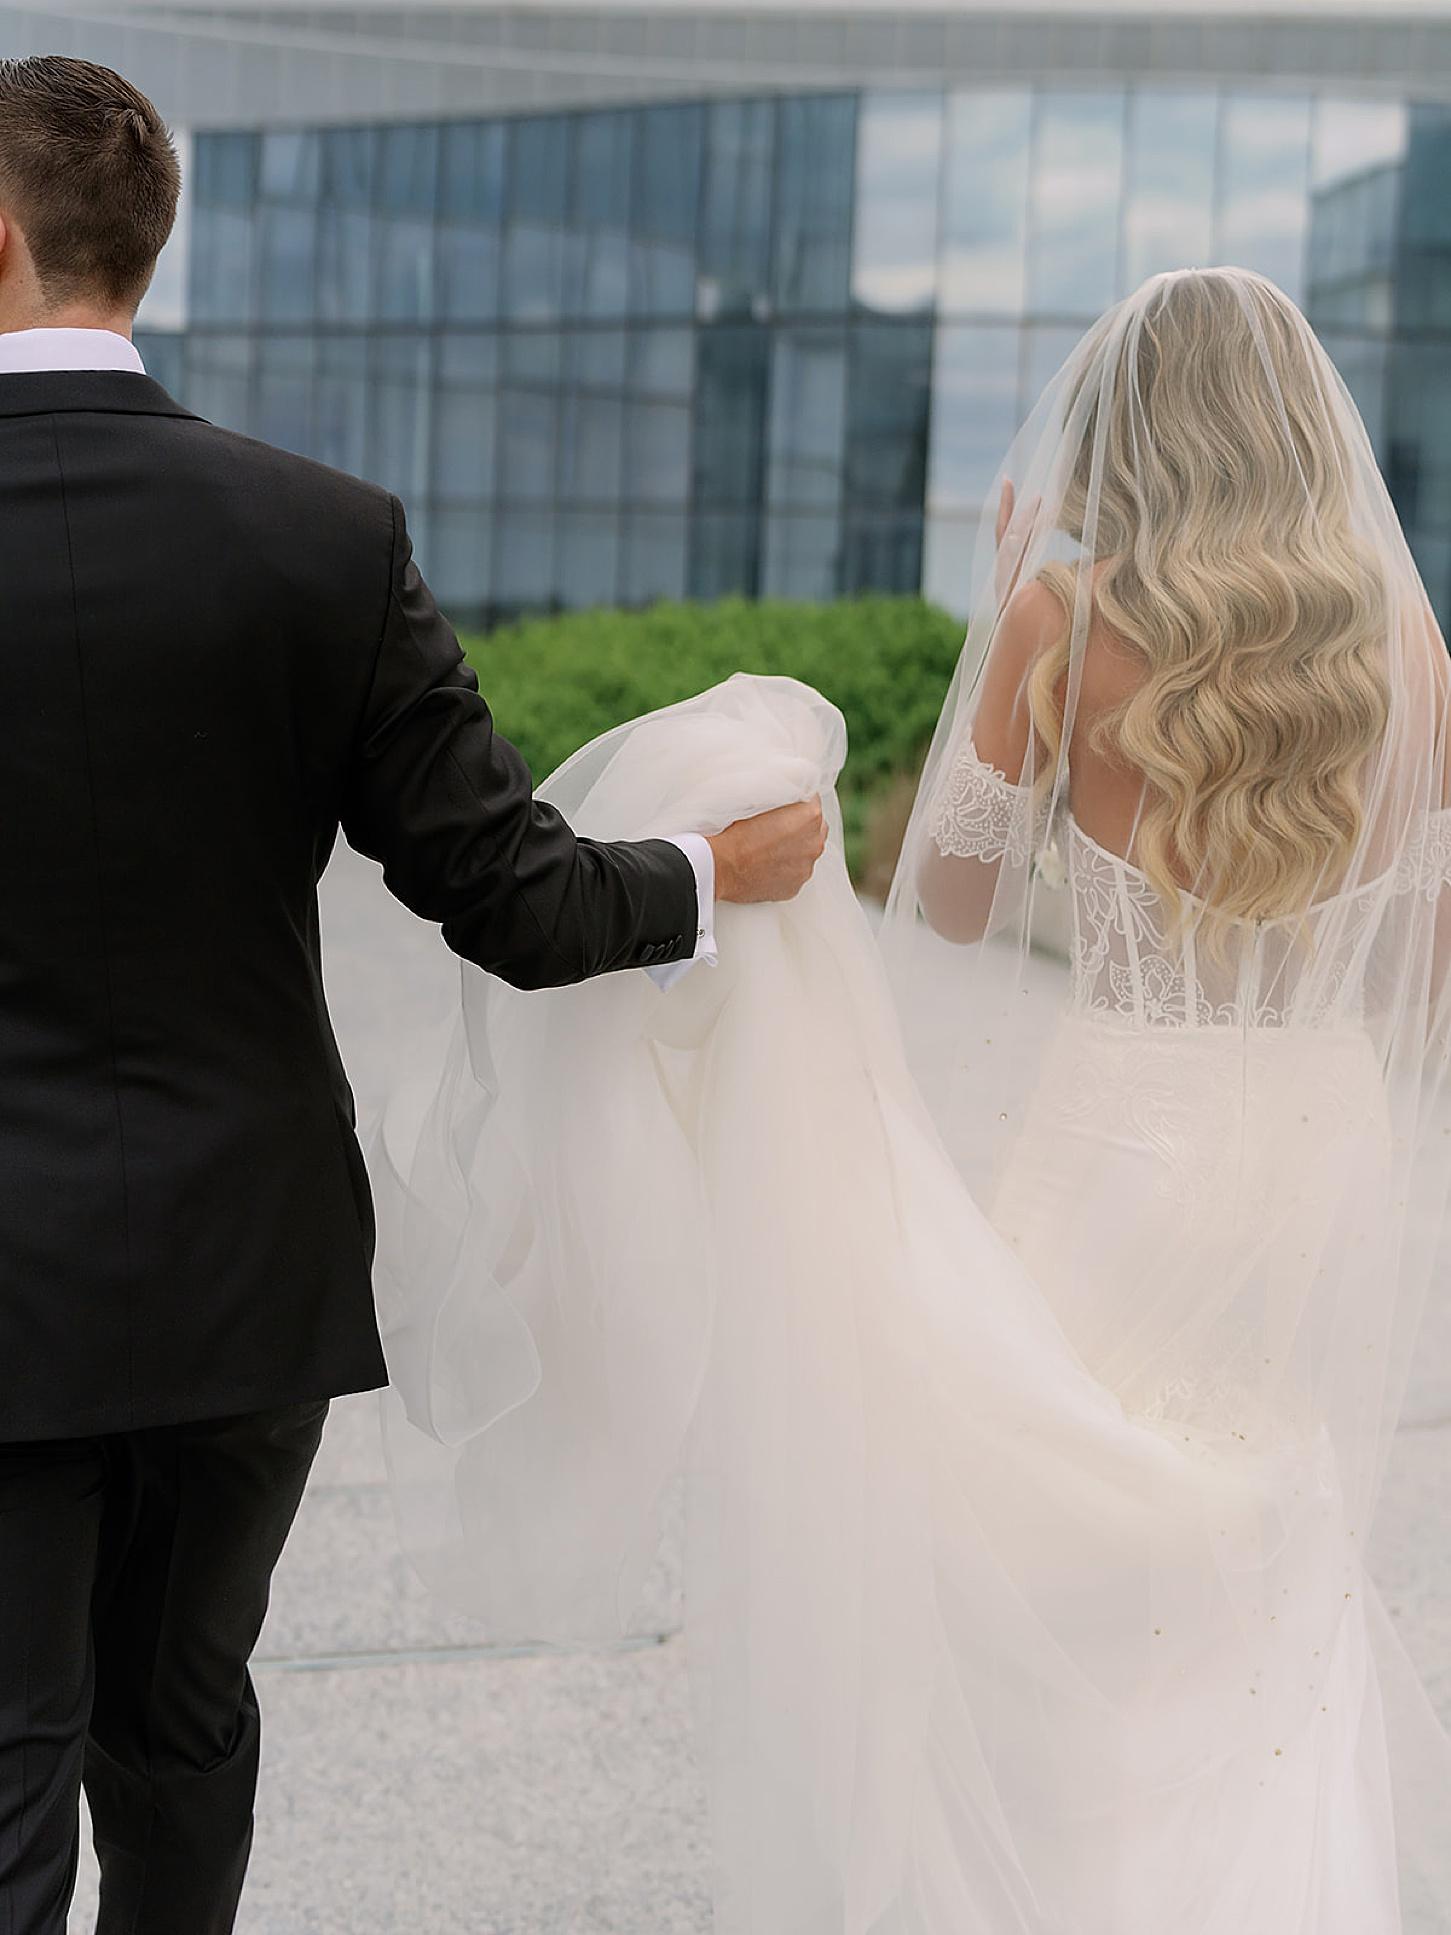 Atlantic City Wedding Photography Studio by Magdalena Studios Lexy Cha 0073